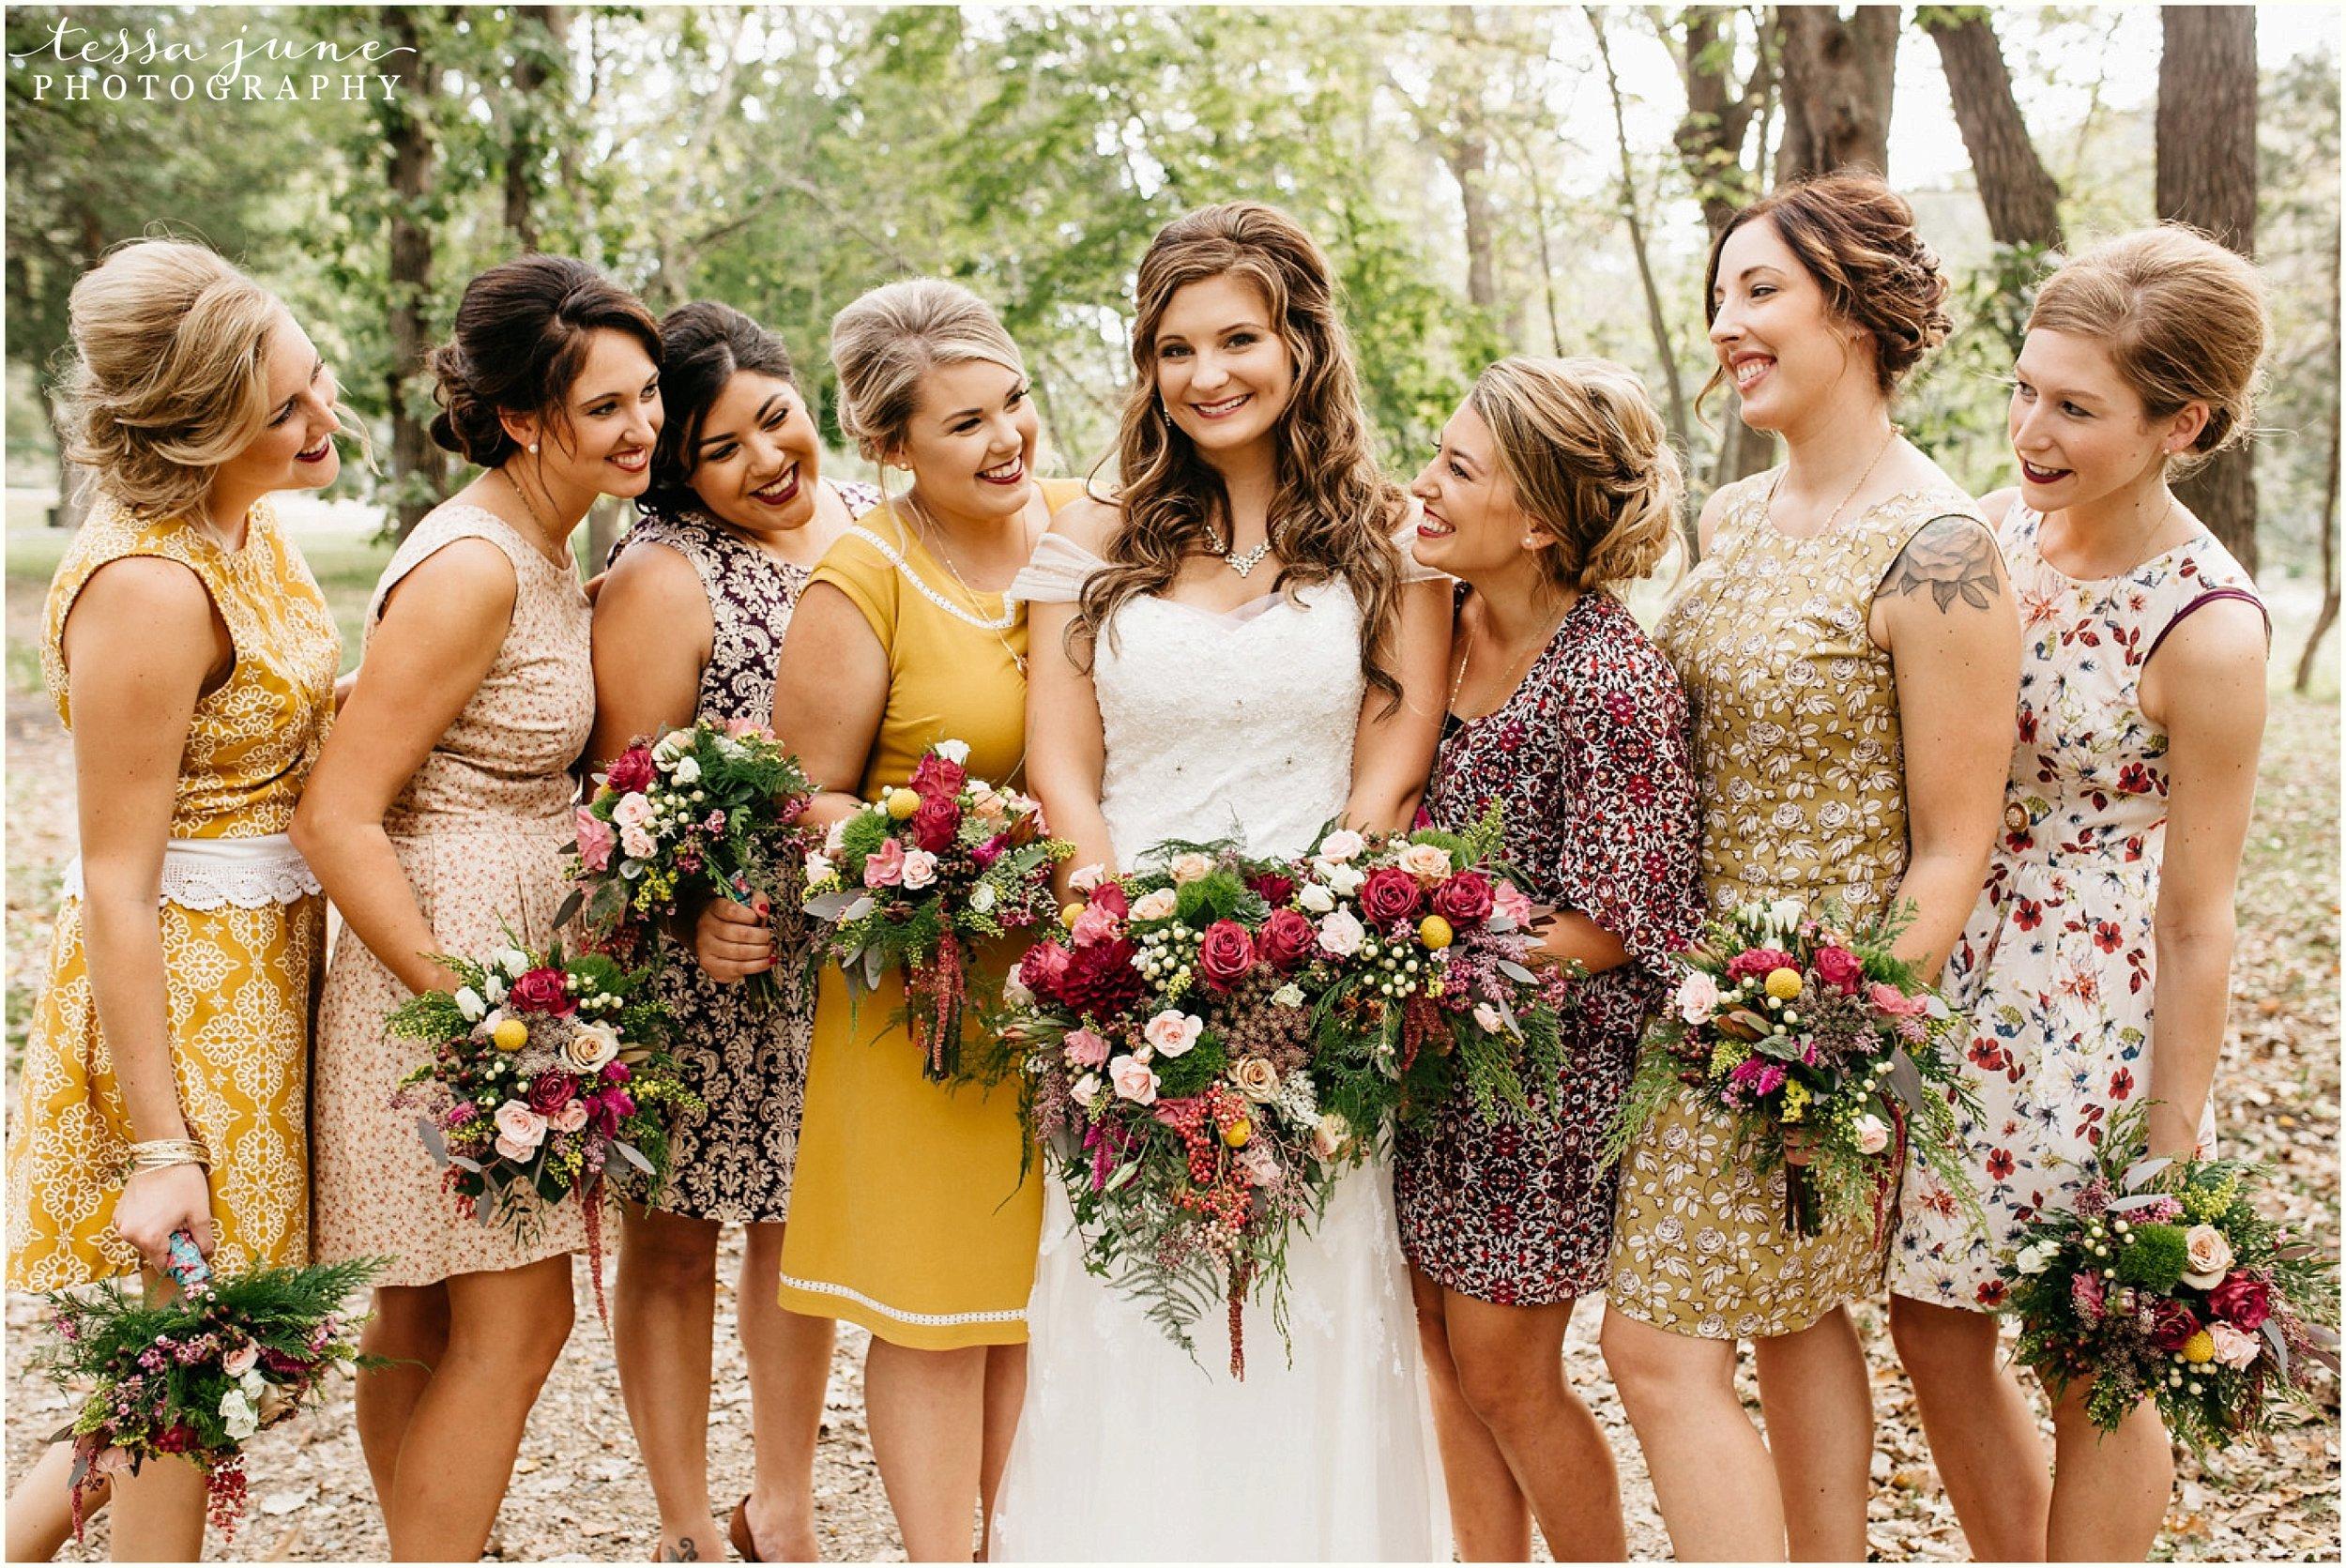 bohemian-minnesota-wedding-mismatched-bridesmaid-dresses-waterfall-st-cloud-tessa-june-photography-73.jpg